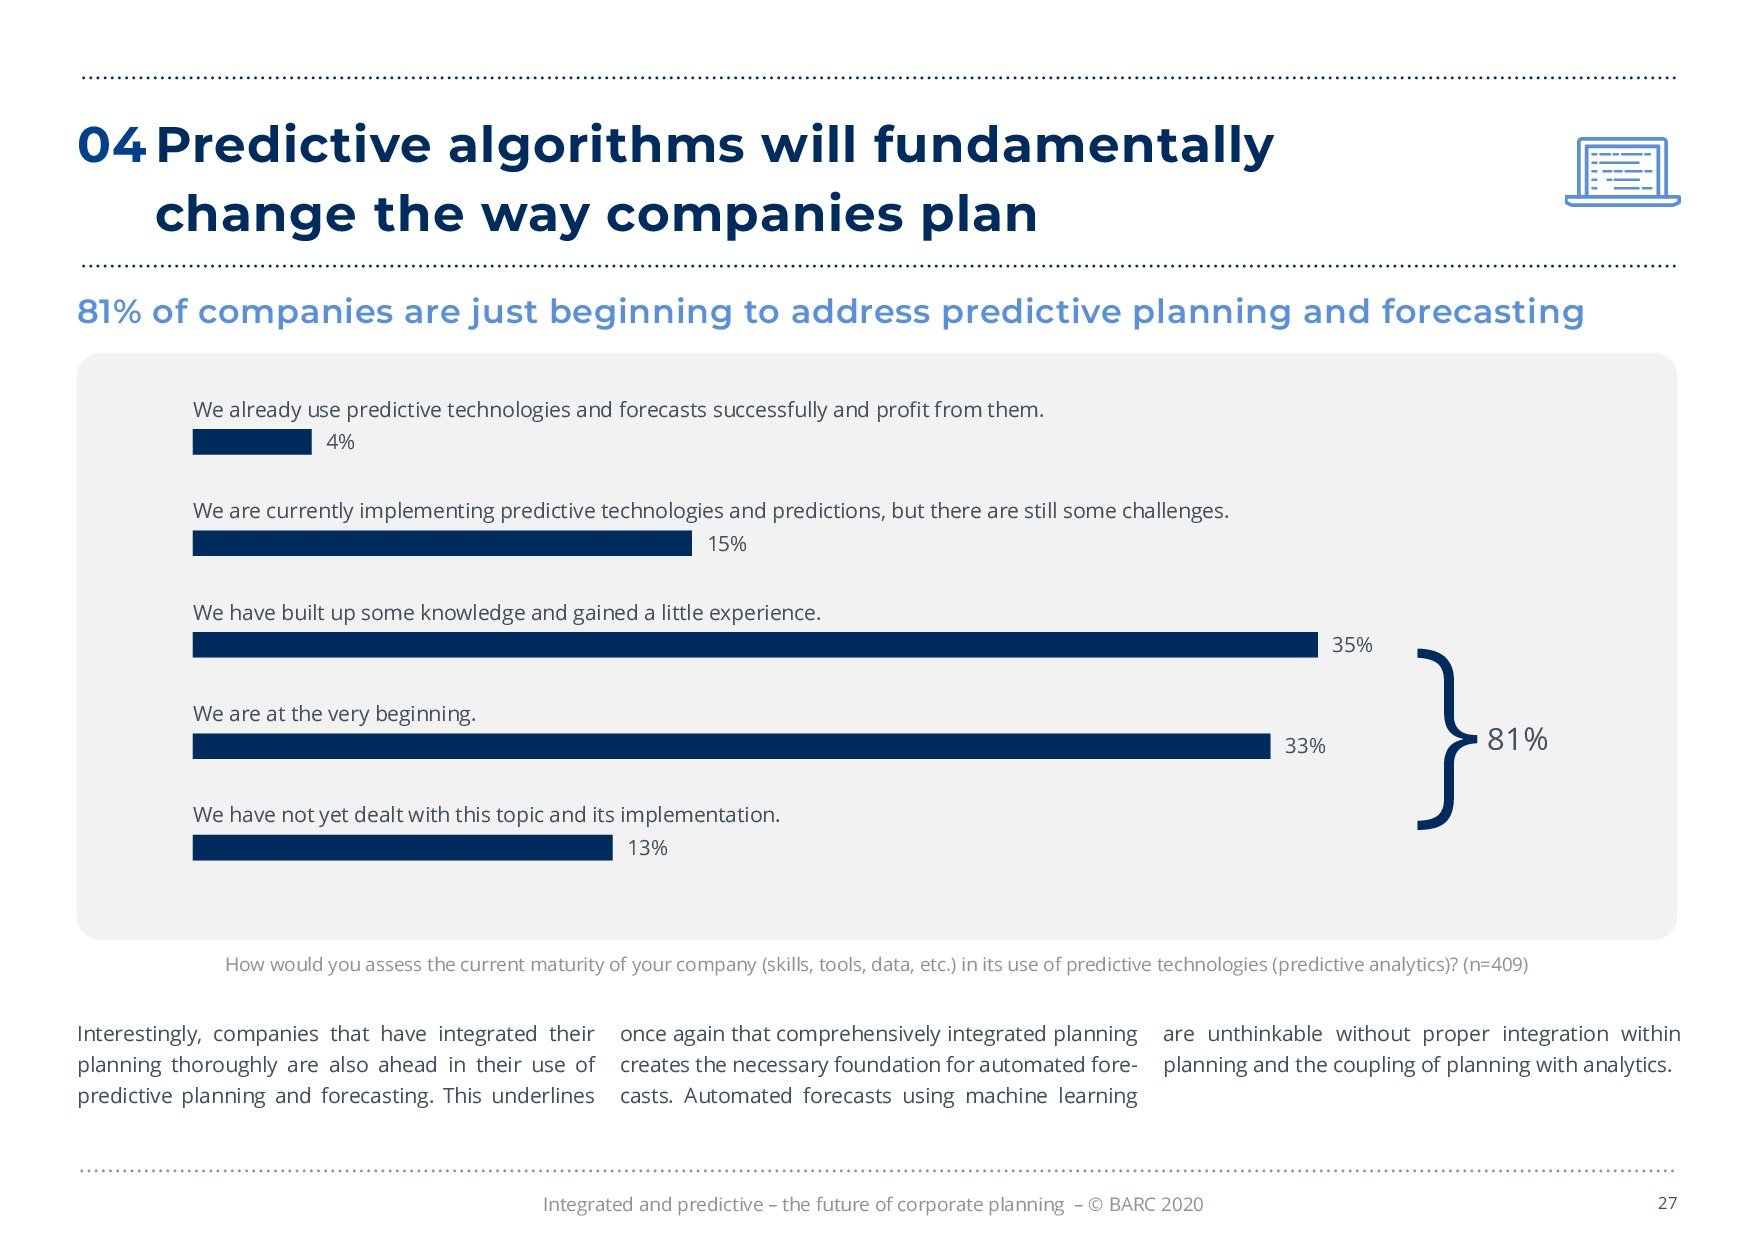 BARC – 統合と予測 – 経営計画の未来 | Page 27